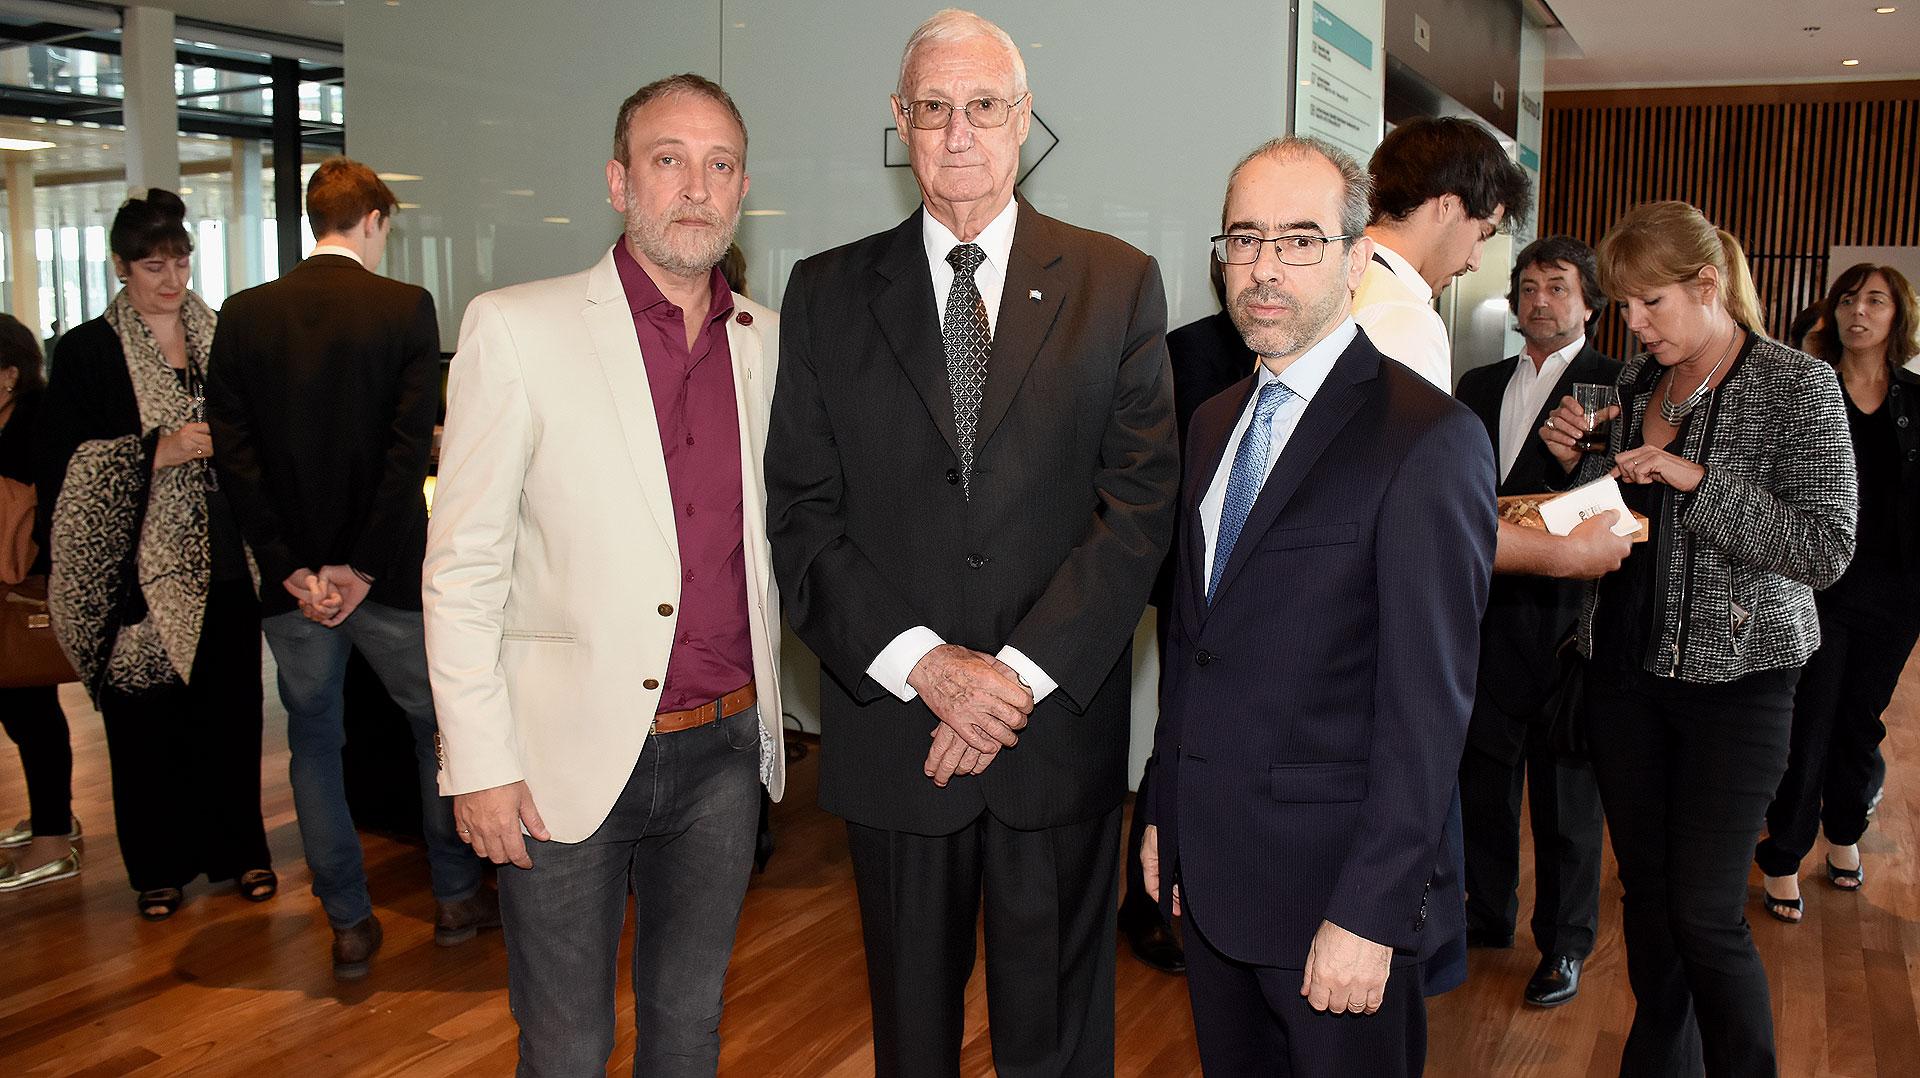 Edi Zunino, Martín Balza y Gustavo González